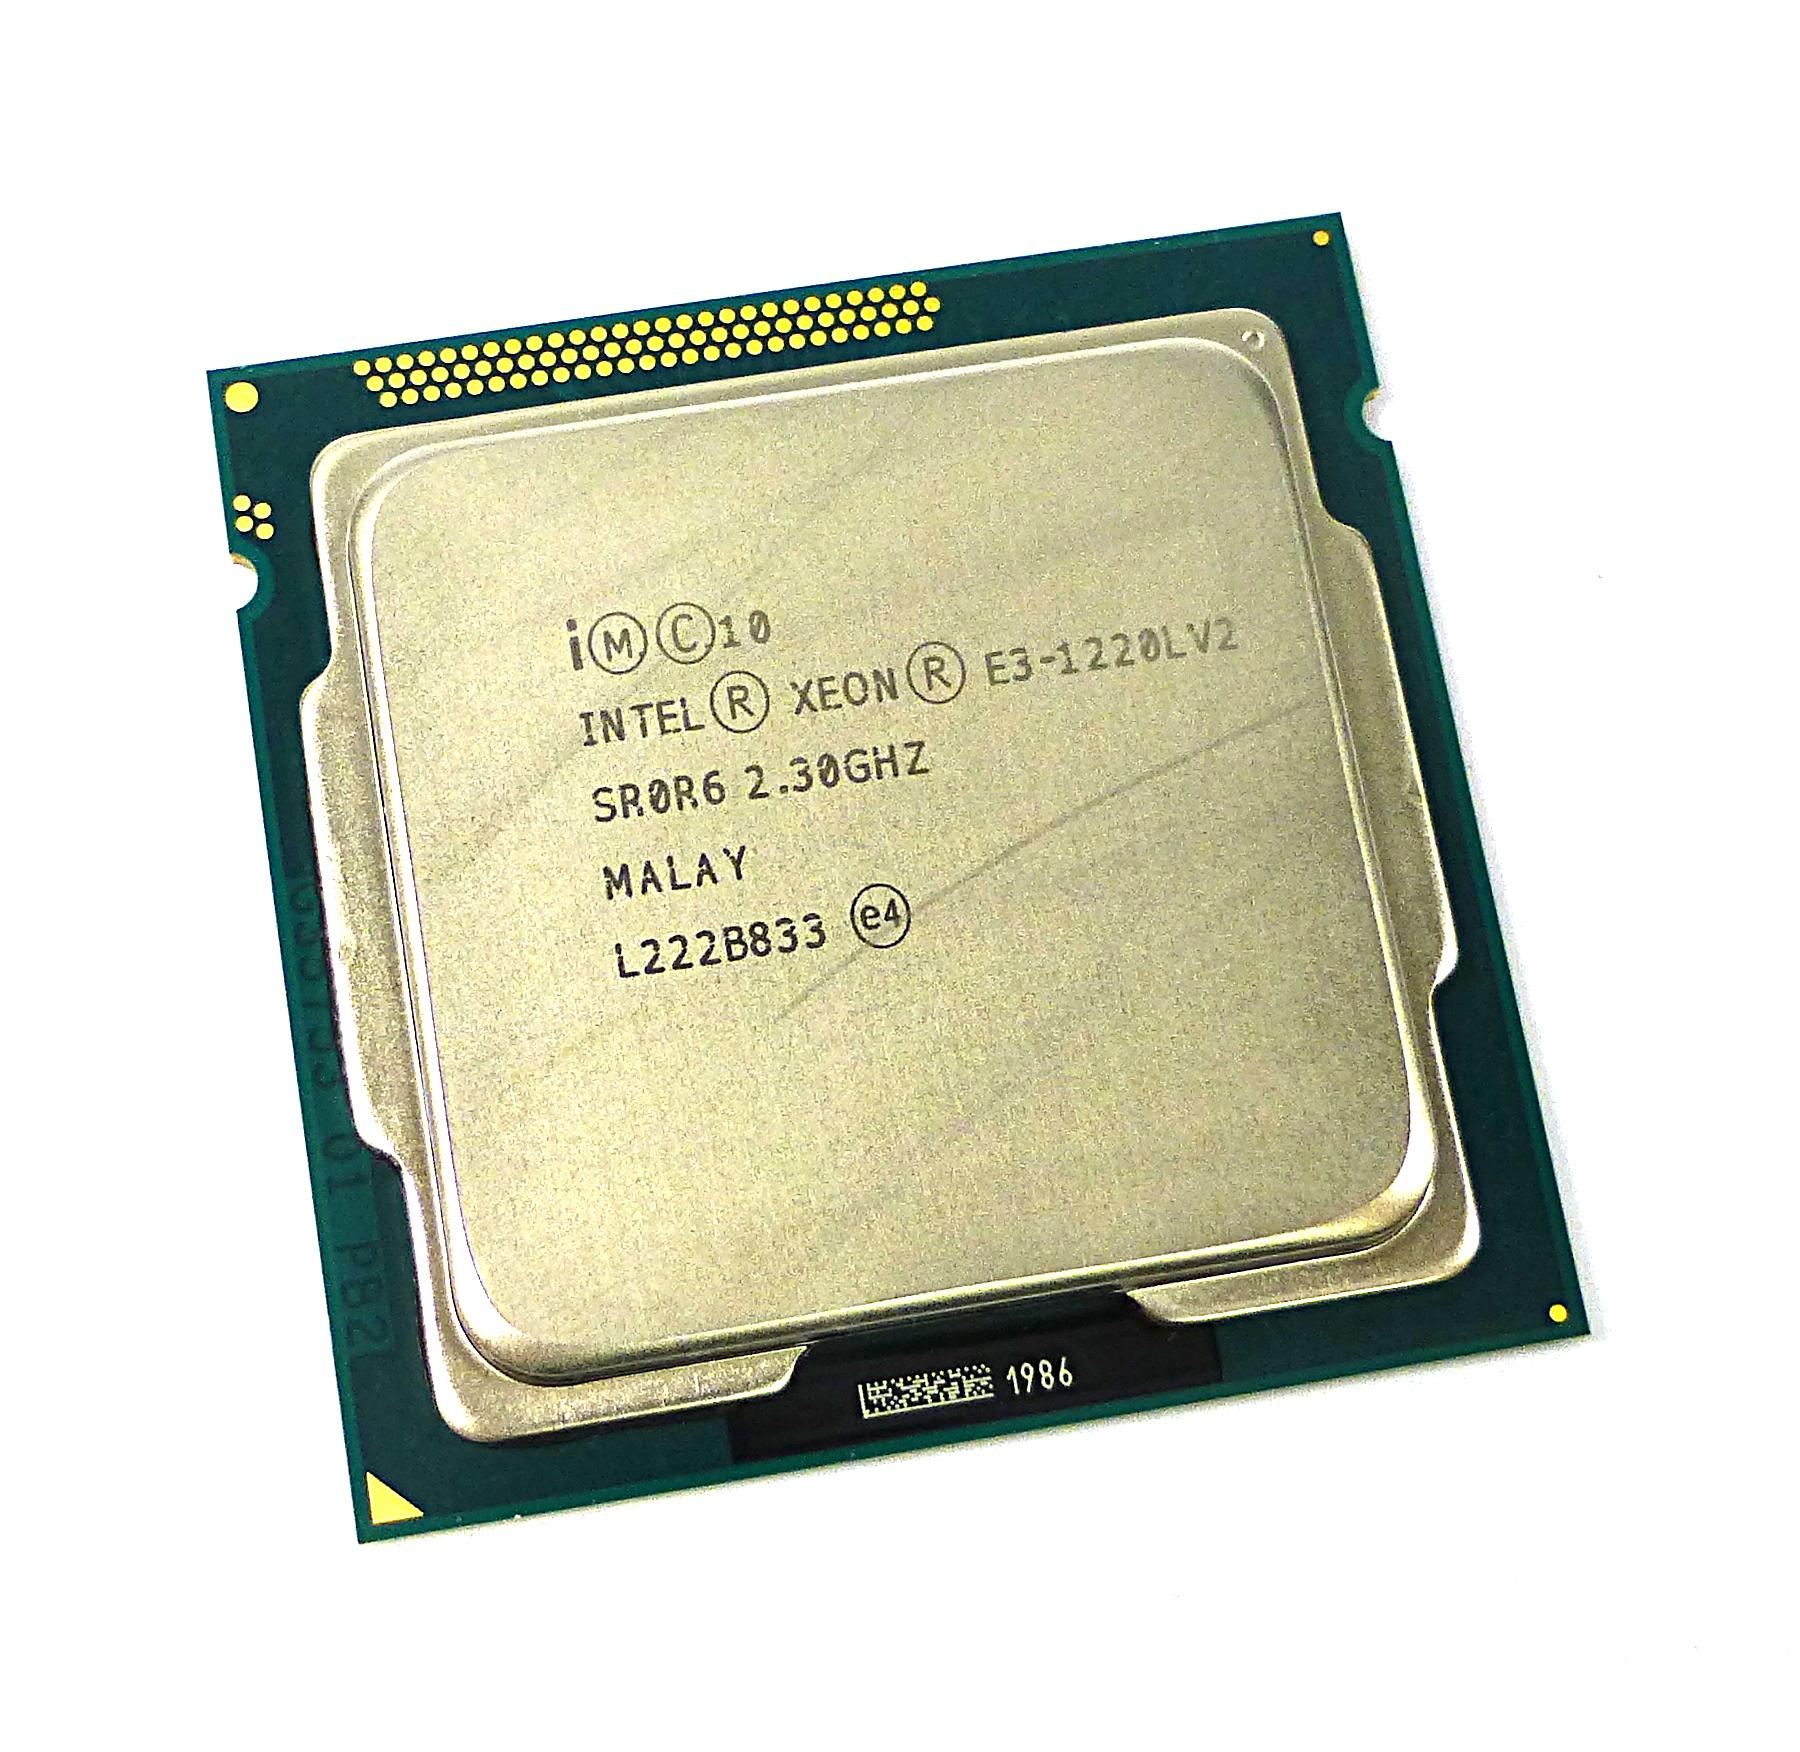 Intel Xeon SR0R6 2.3GHz Dual Core Socket LGA1155 Processor E3-1220LV2